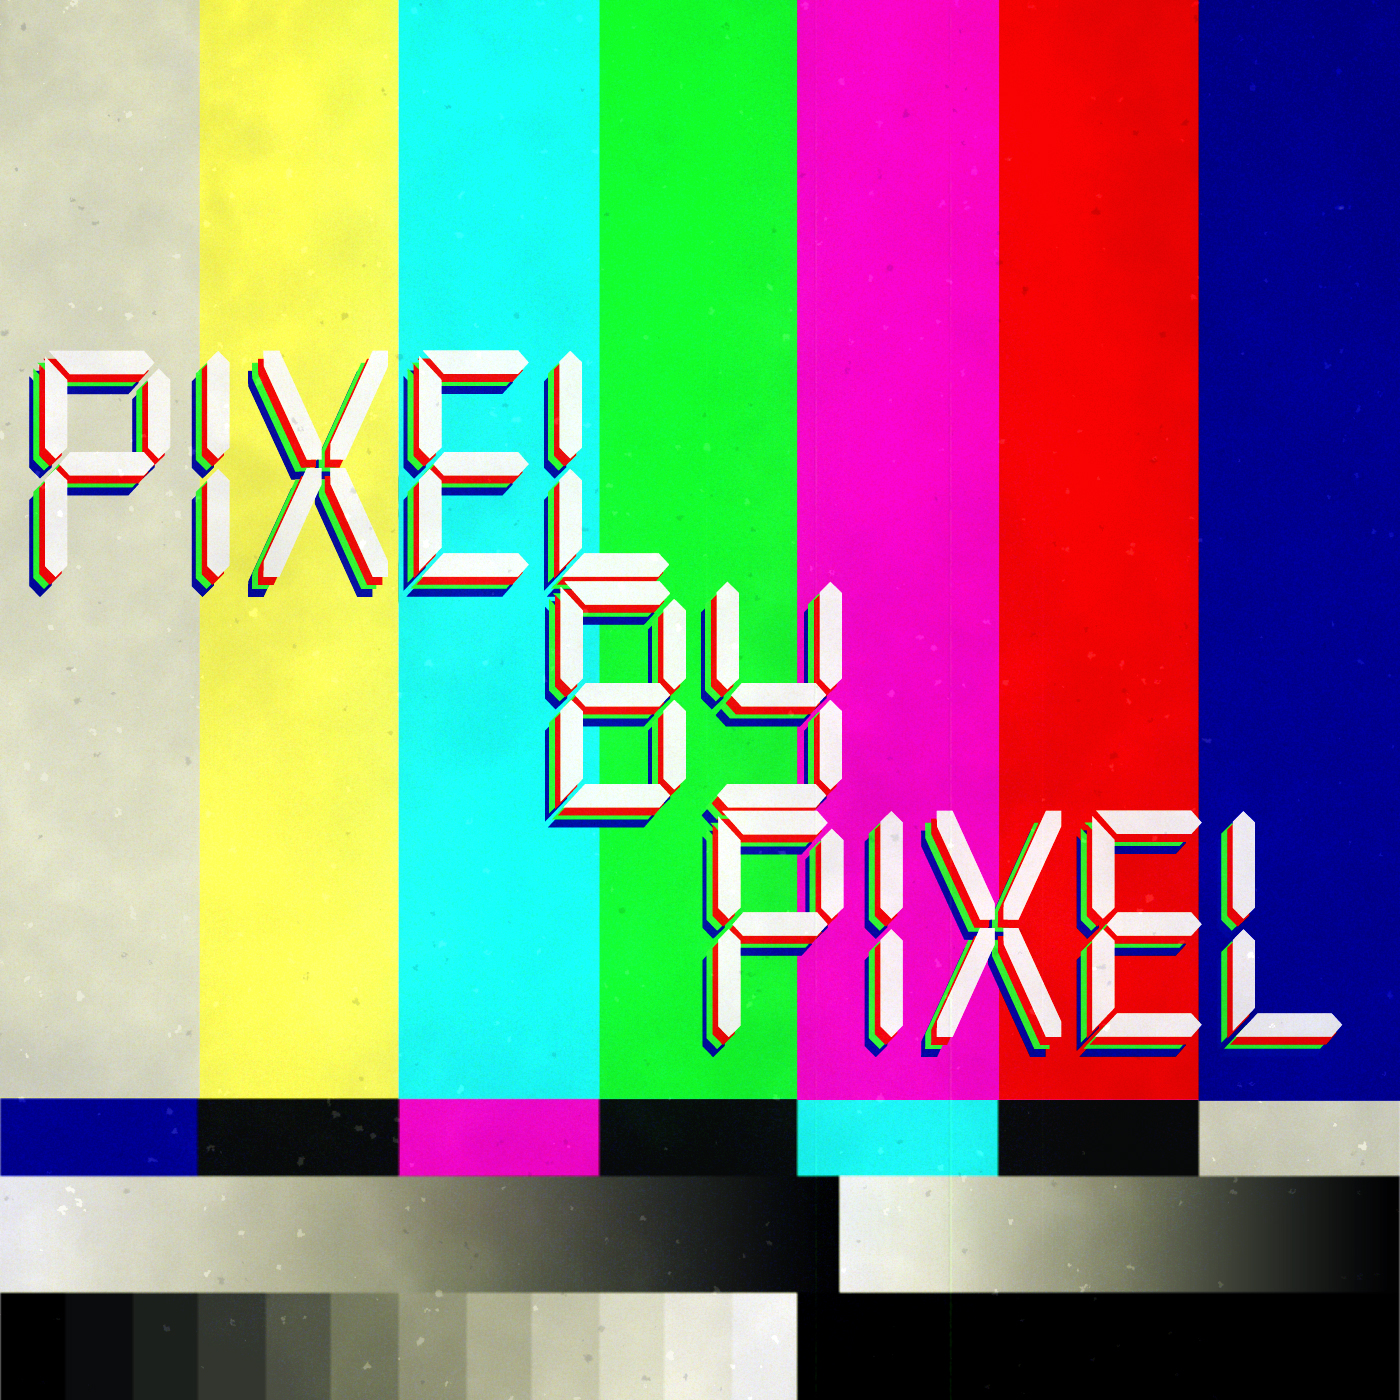 Pixel by Pixel - Episode 3 - I Choose You, Patritar